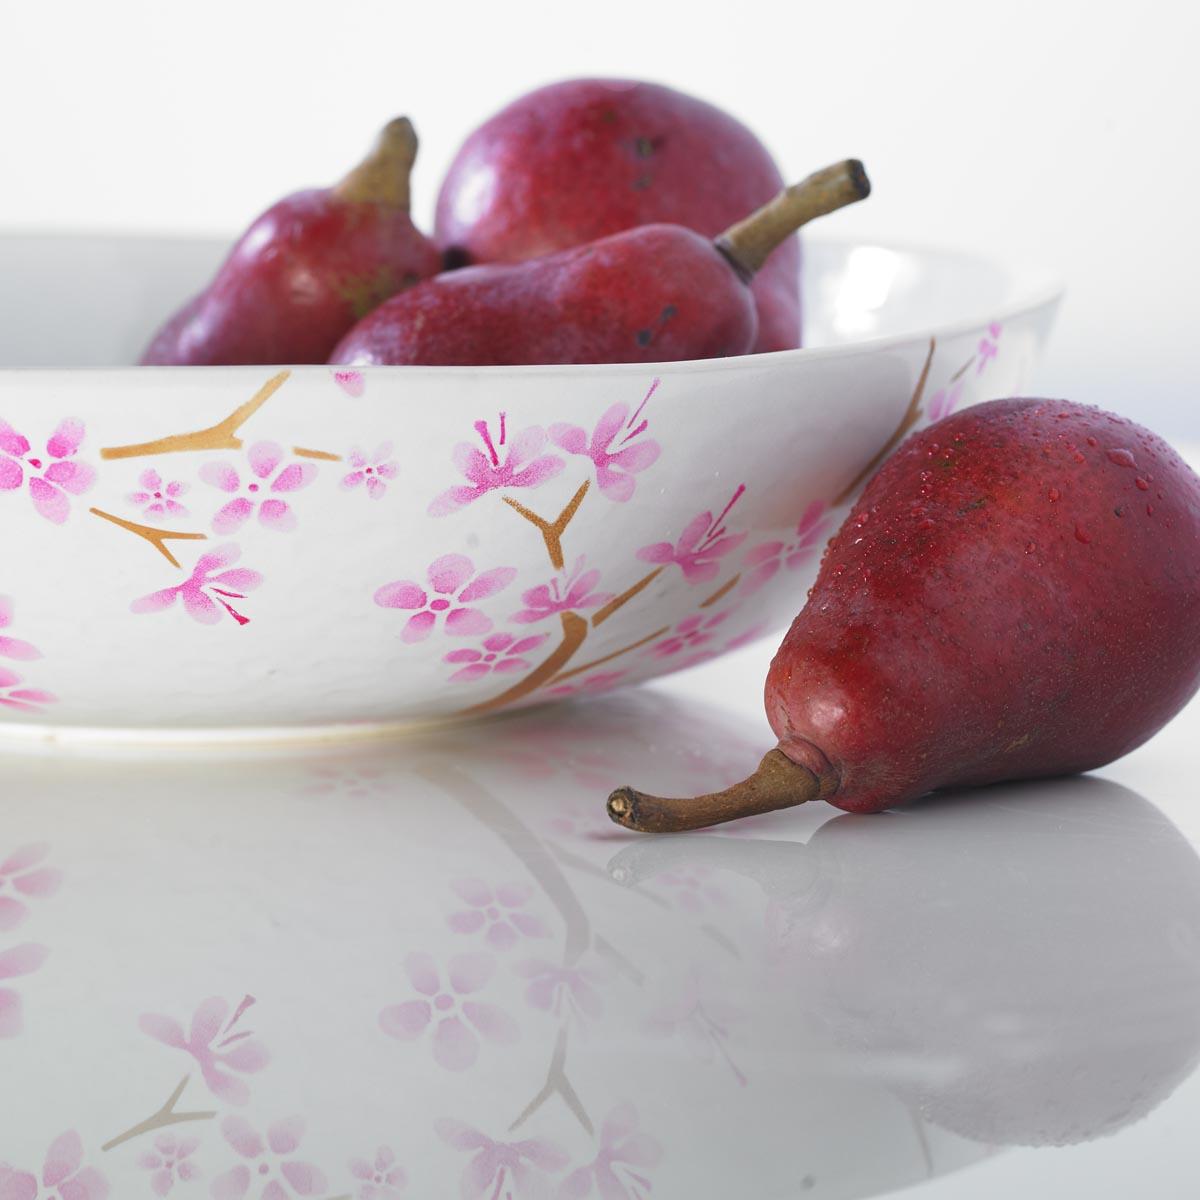 FolkArt ® Painting Stencils - Small - Cherry Blossom - 13224